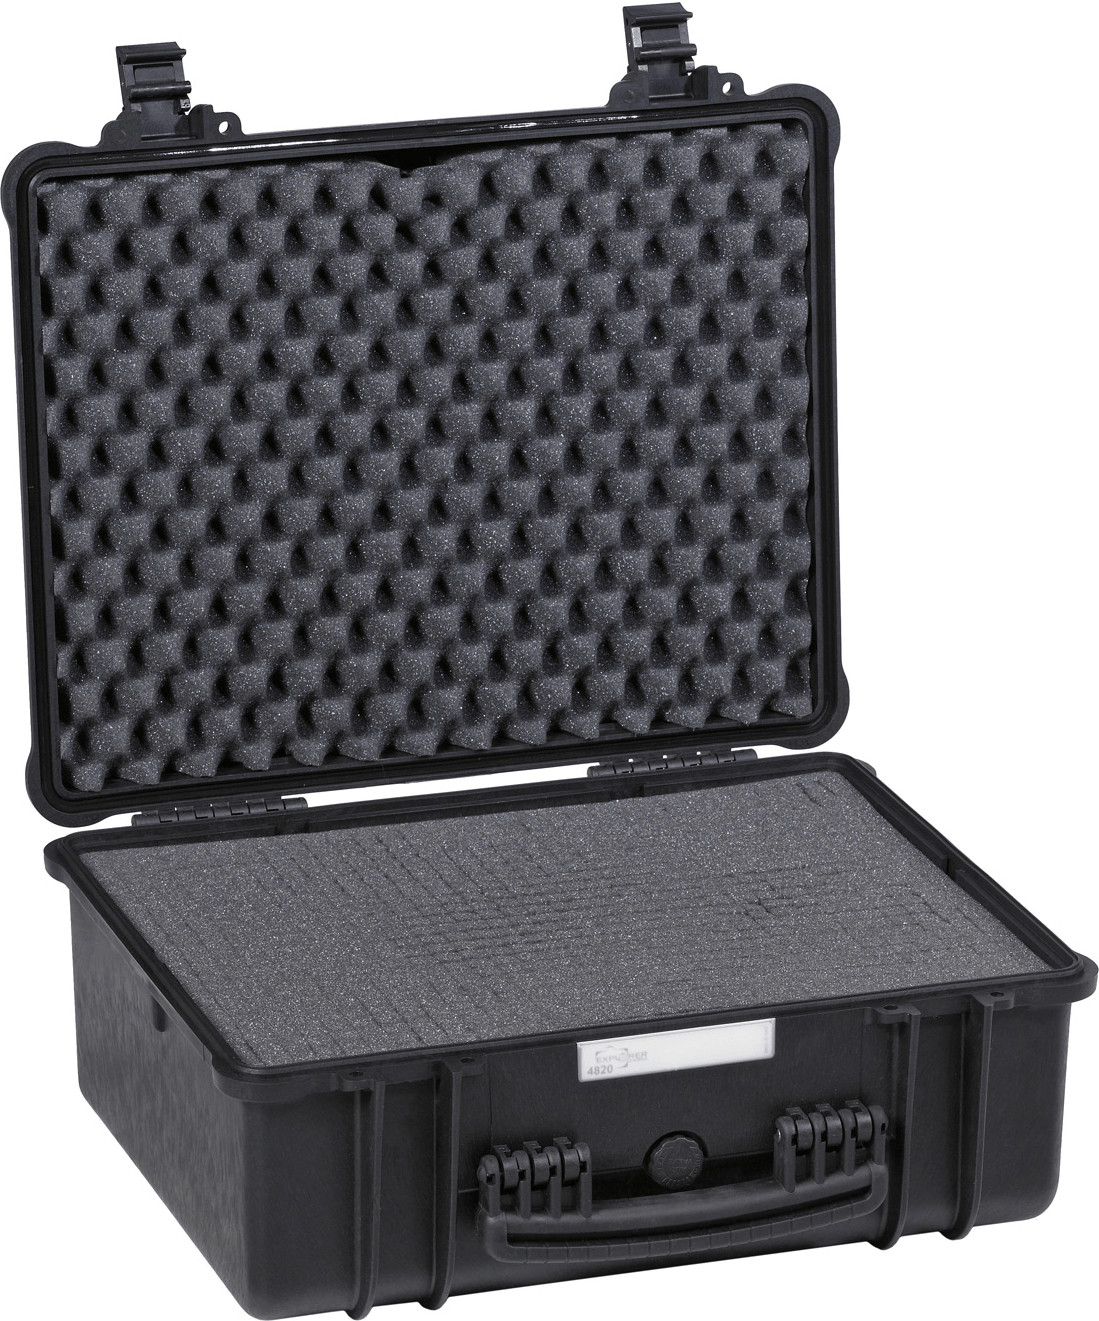 Image of Explorer Cases 4820 B